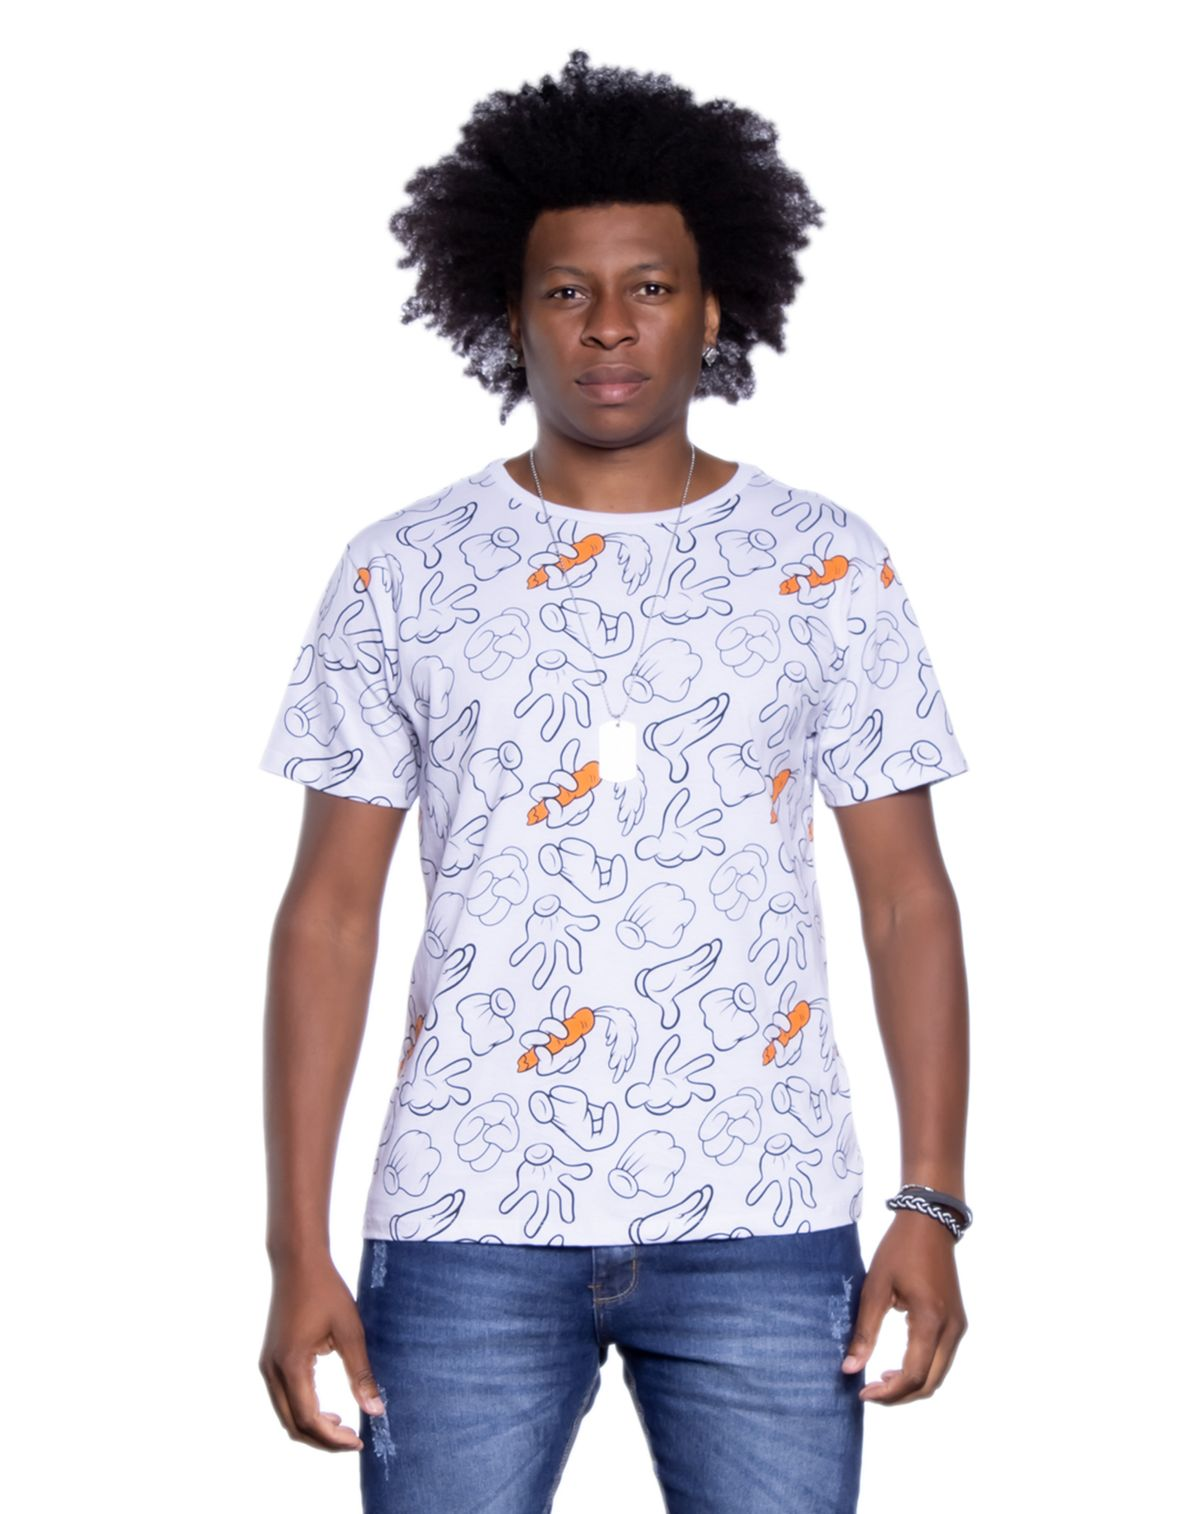 588399001-camiseta-manga-curta-masculina-looney-tunes-branco-p-ded